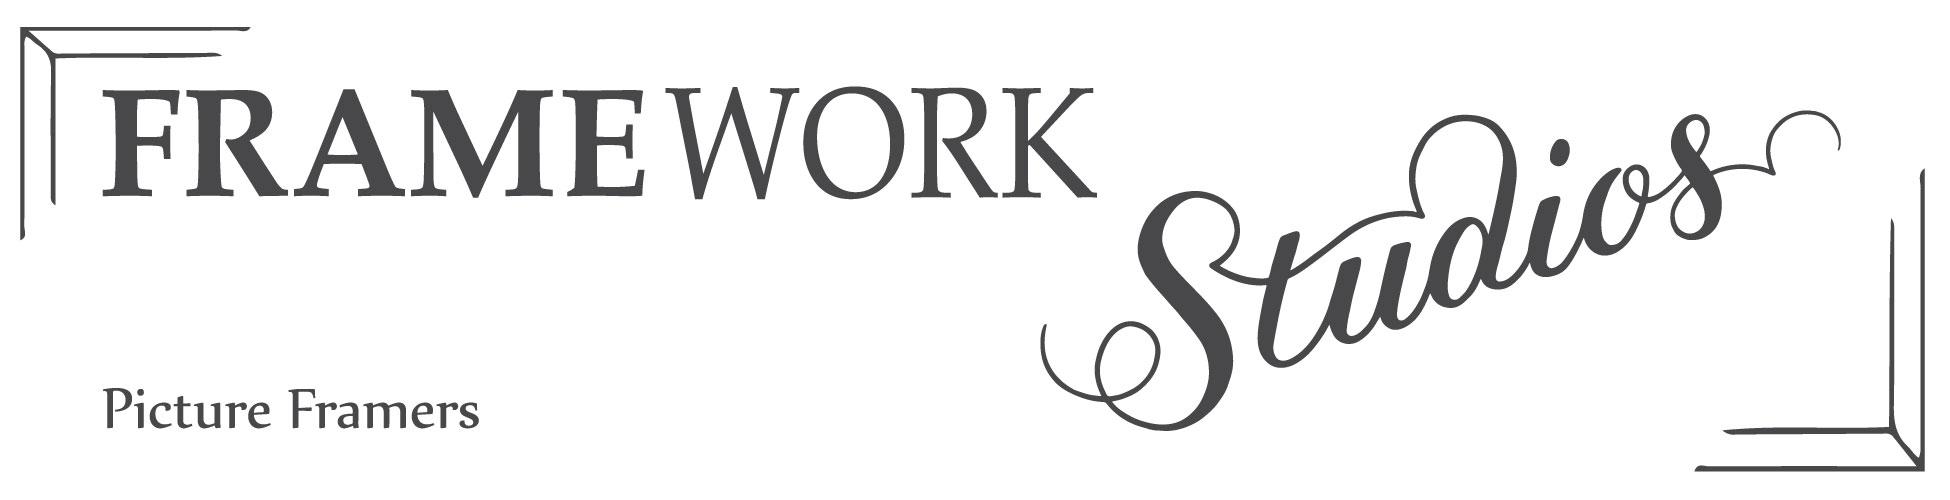 Framework Studios Picture Framers